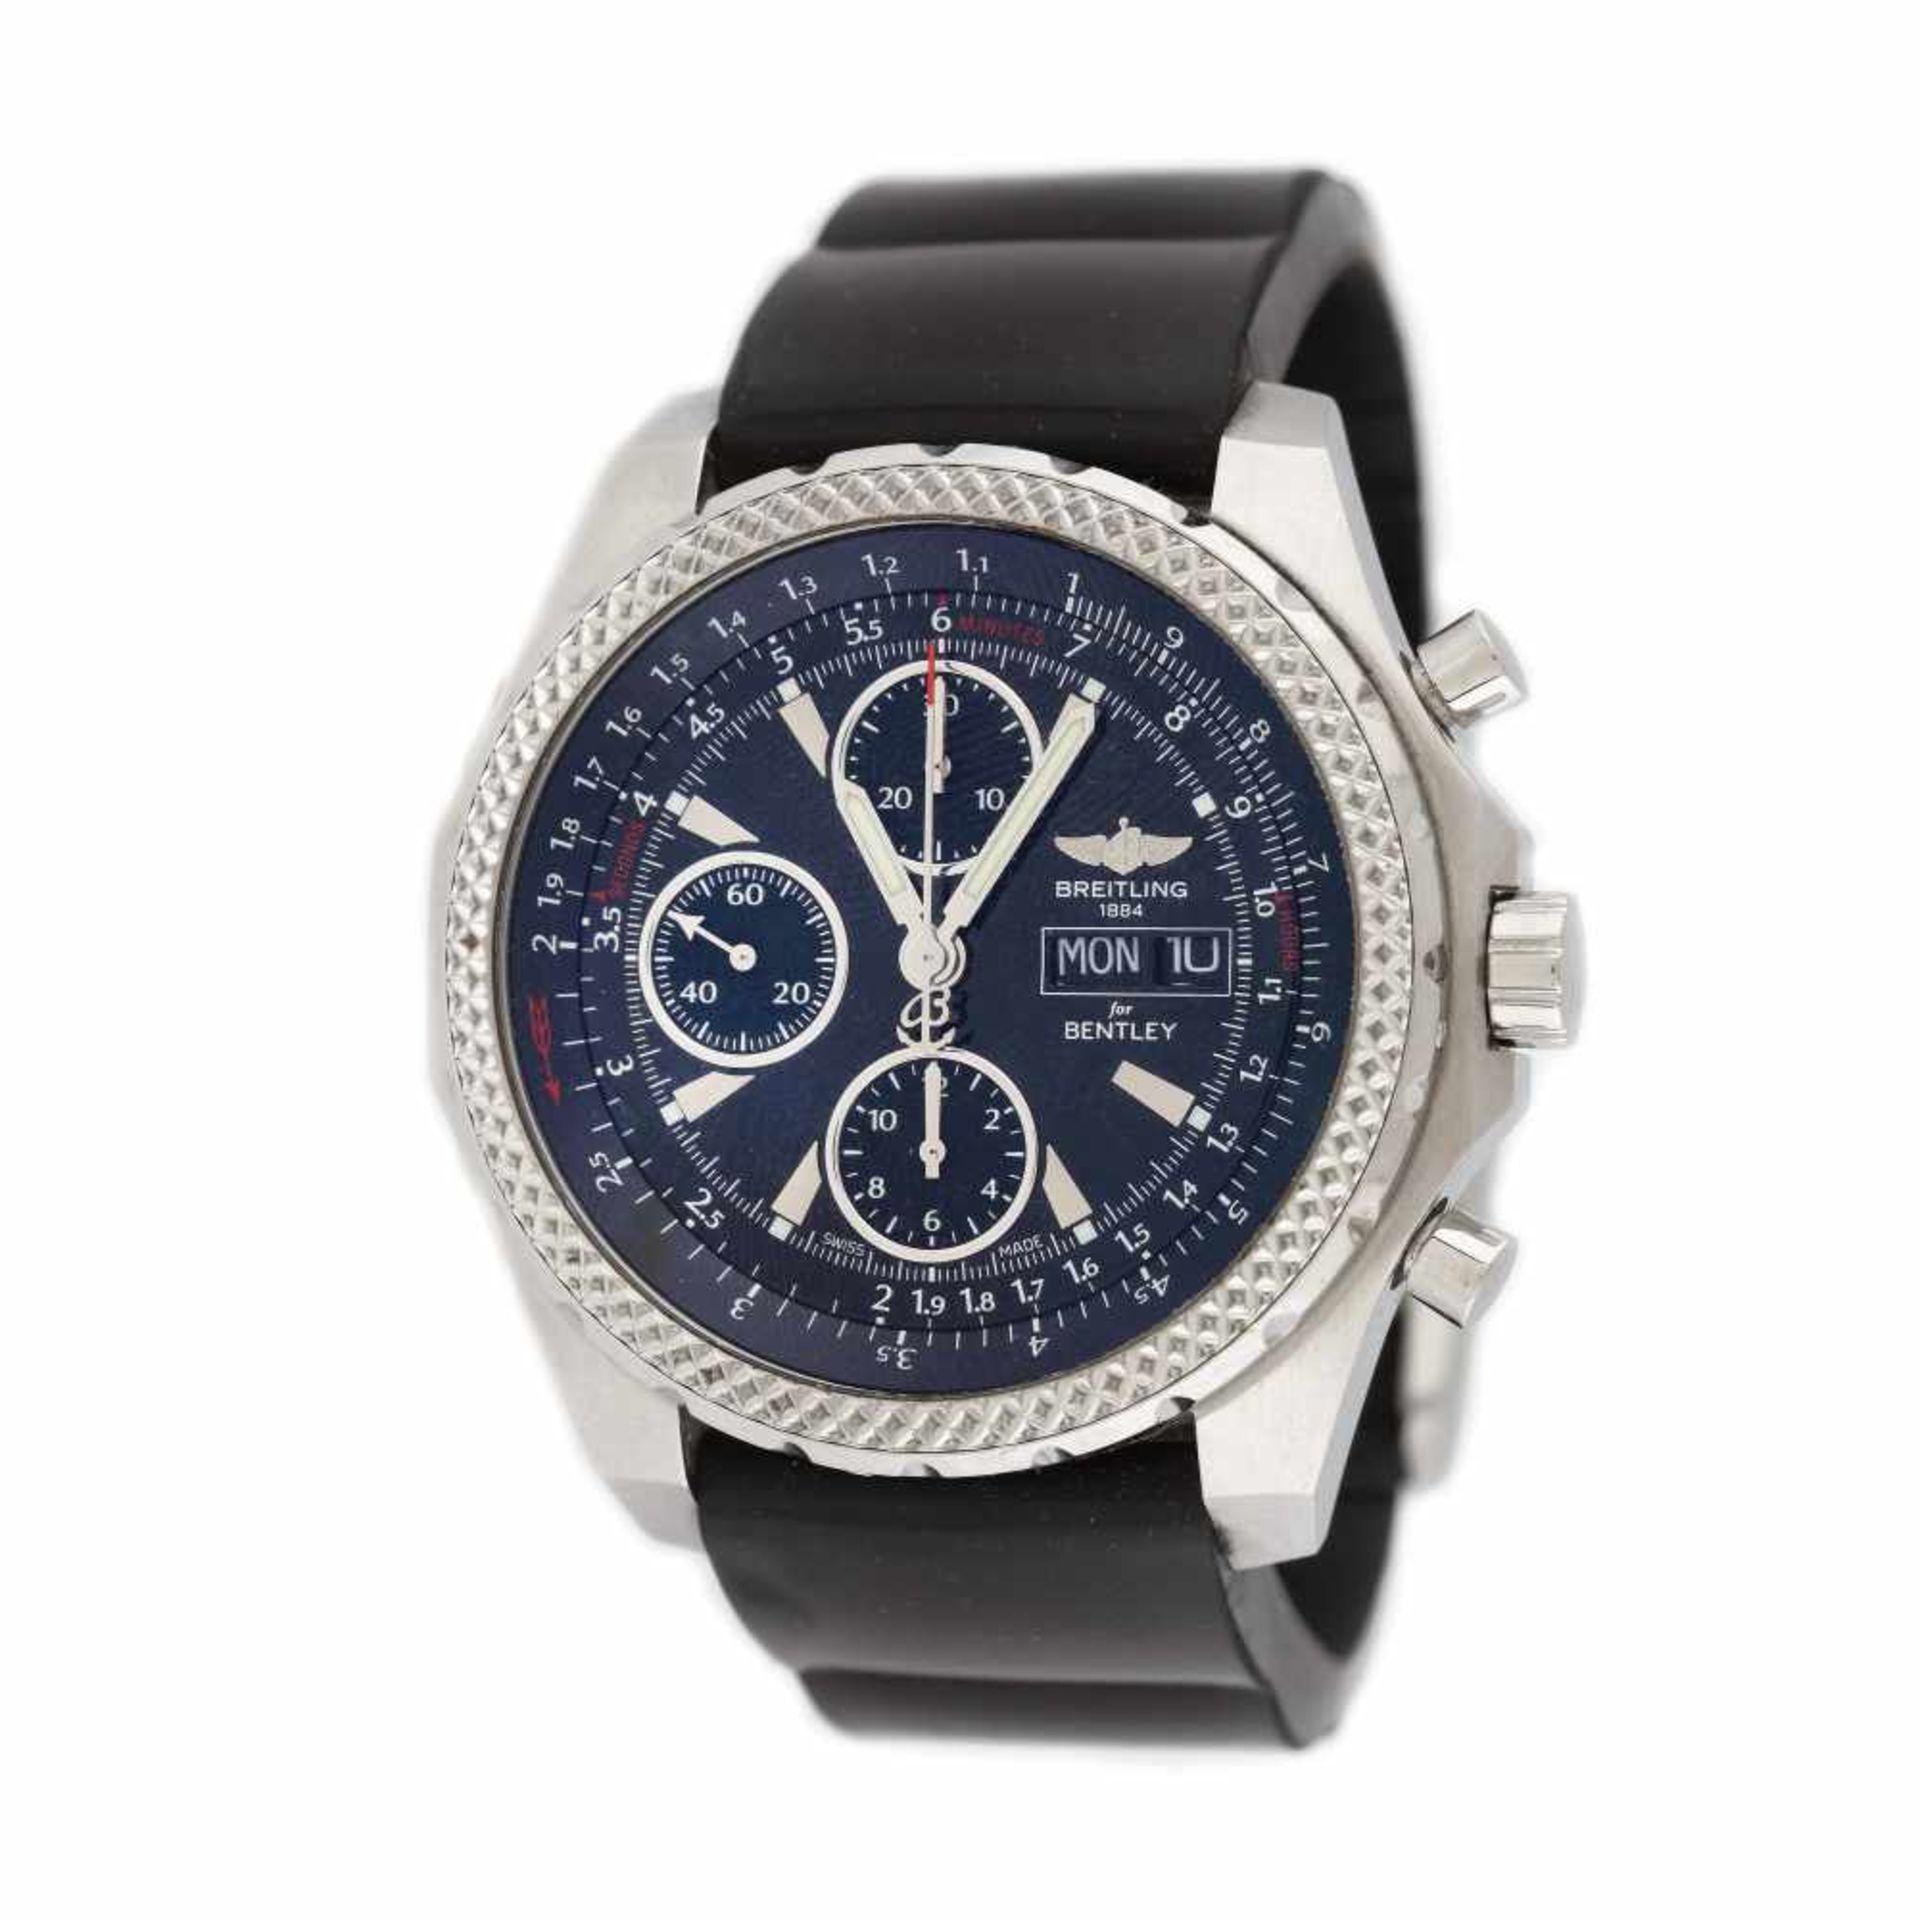 Breitling wristwatch, made for Bentley, men